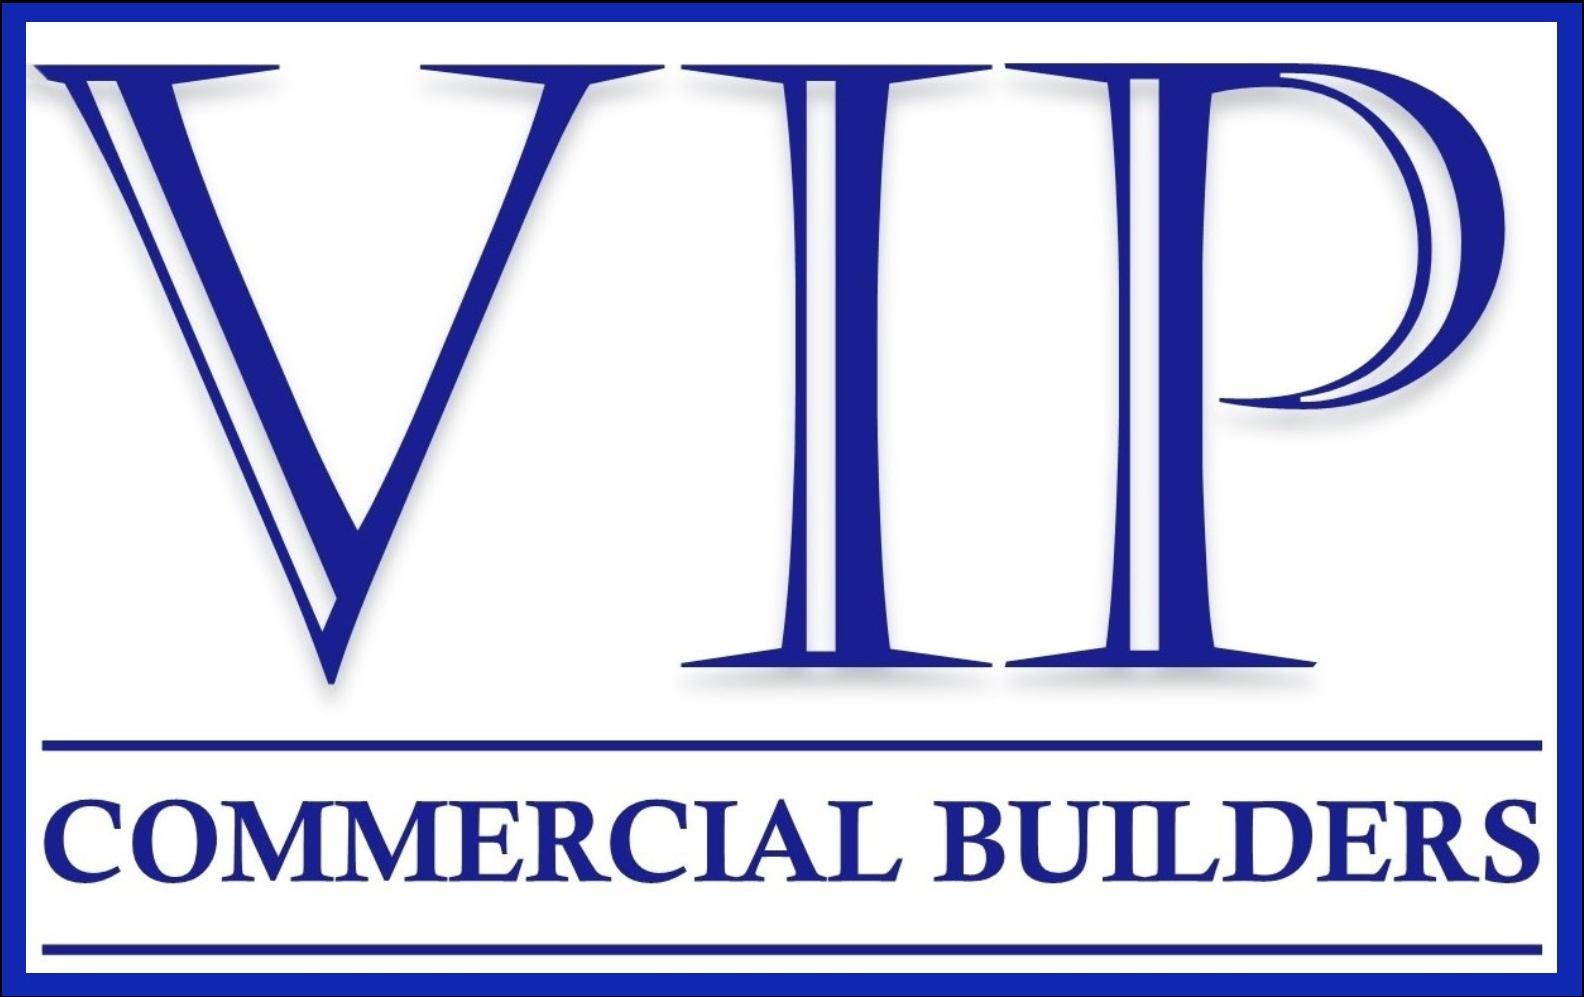 VIP Commercial Builders